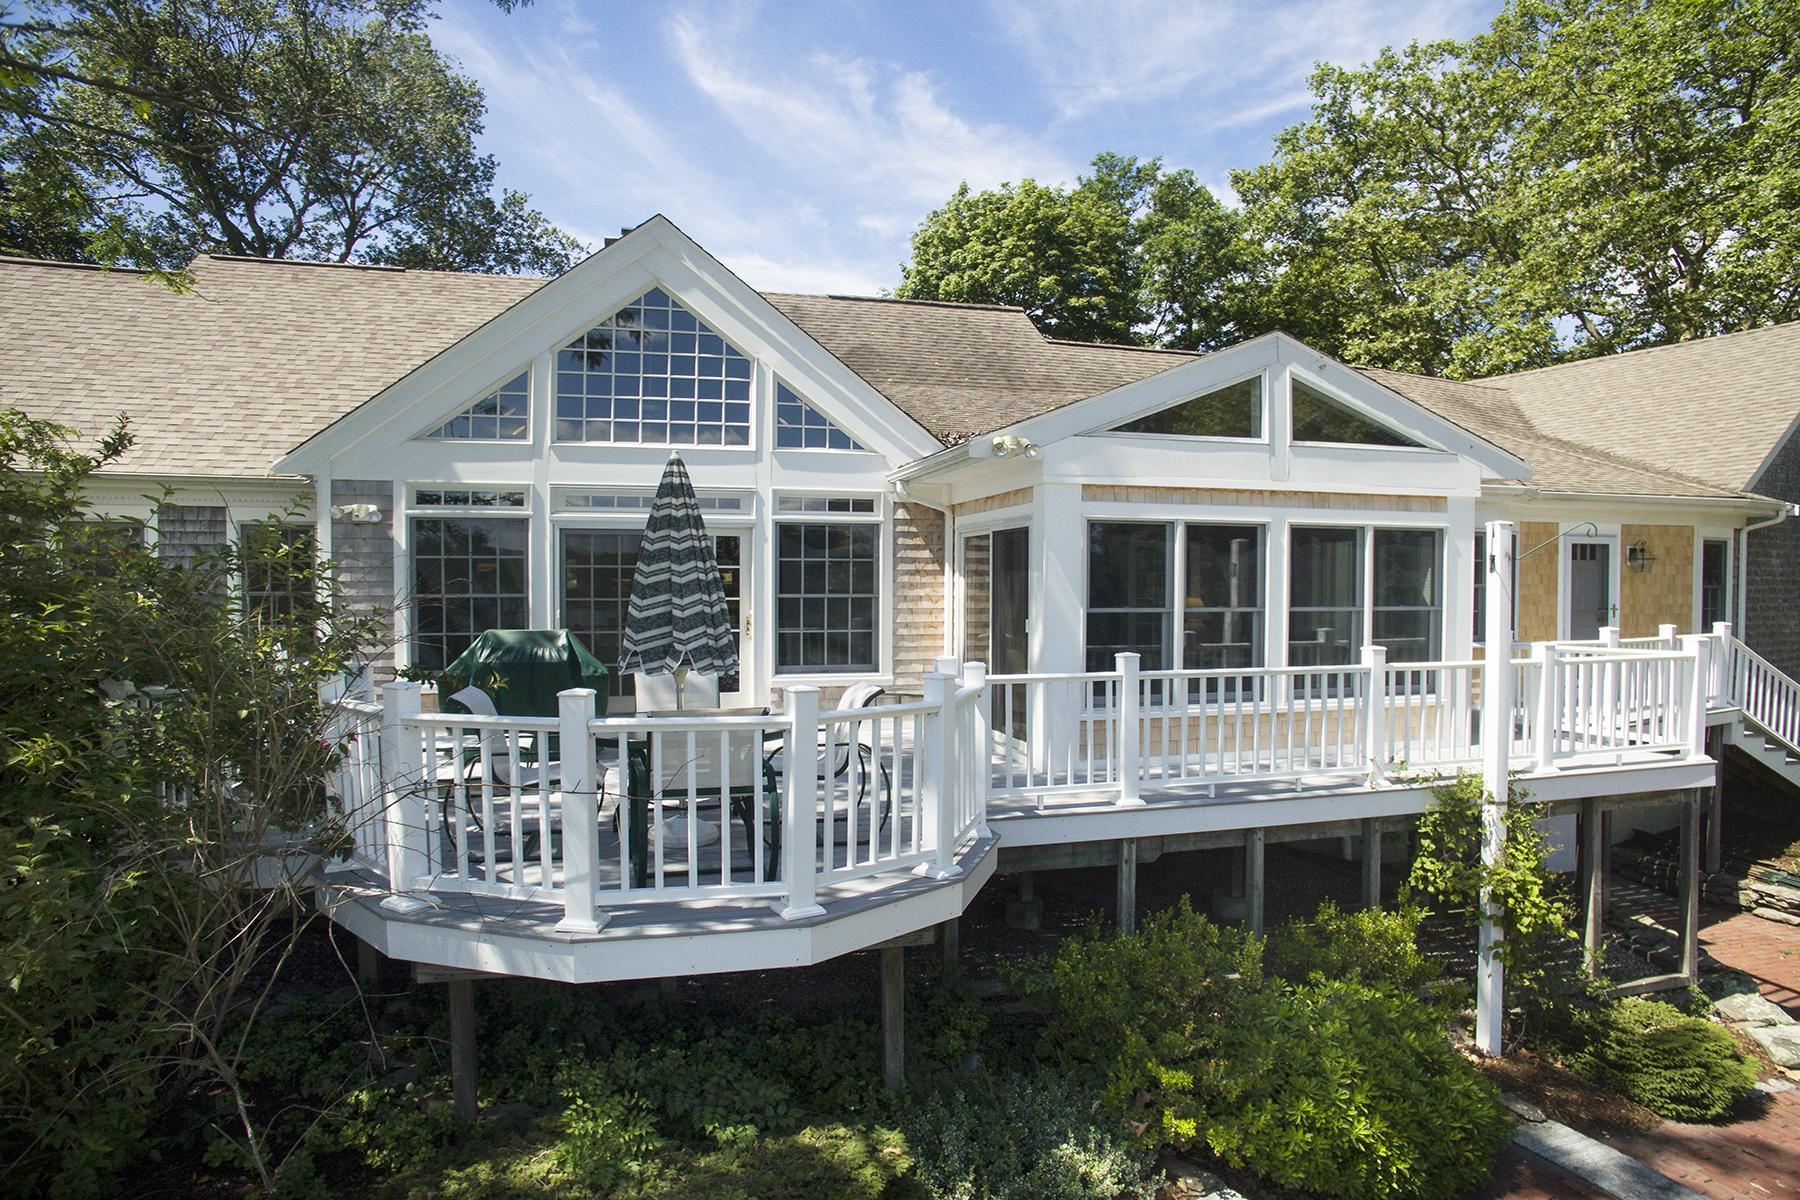 Additional photo for property listing at Nanaquaket Cape 556 Nanaquaket Road Tiverton, Rhode Island 02878 United States